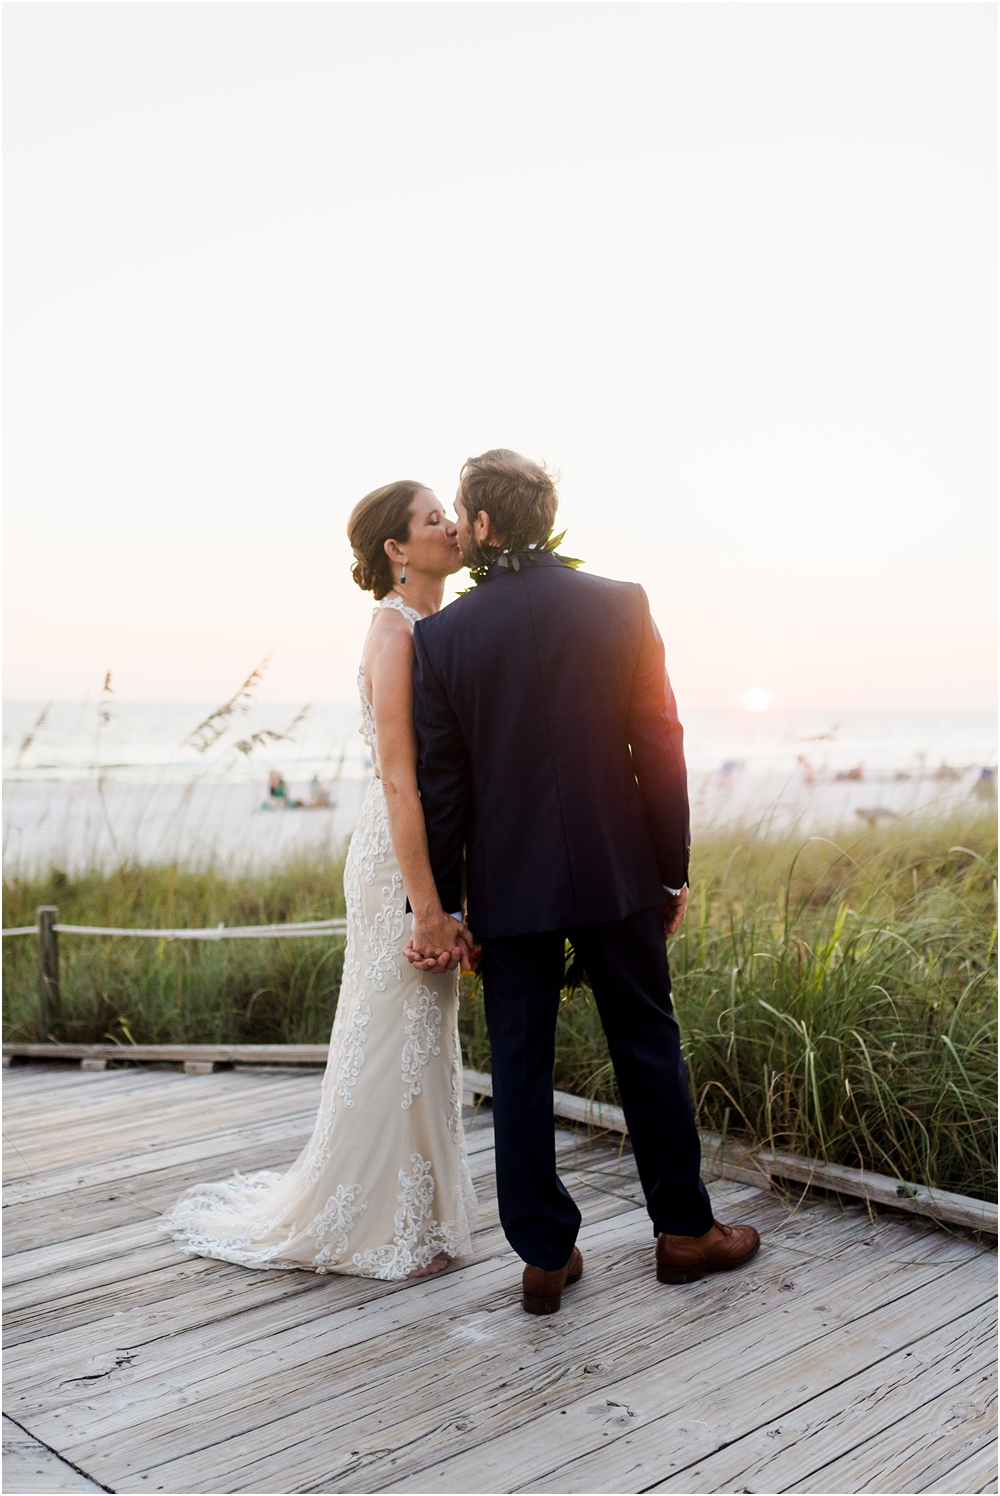 ledman-wedding-kiersten-stevenson-photography-30a-panama-city-beach-dothan-tallahassee-(511-of-763).JPG